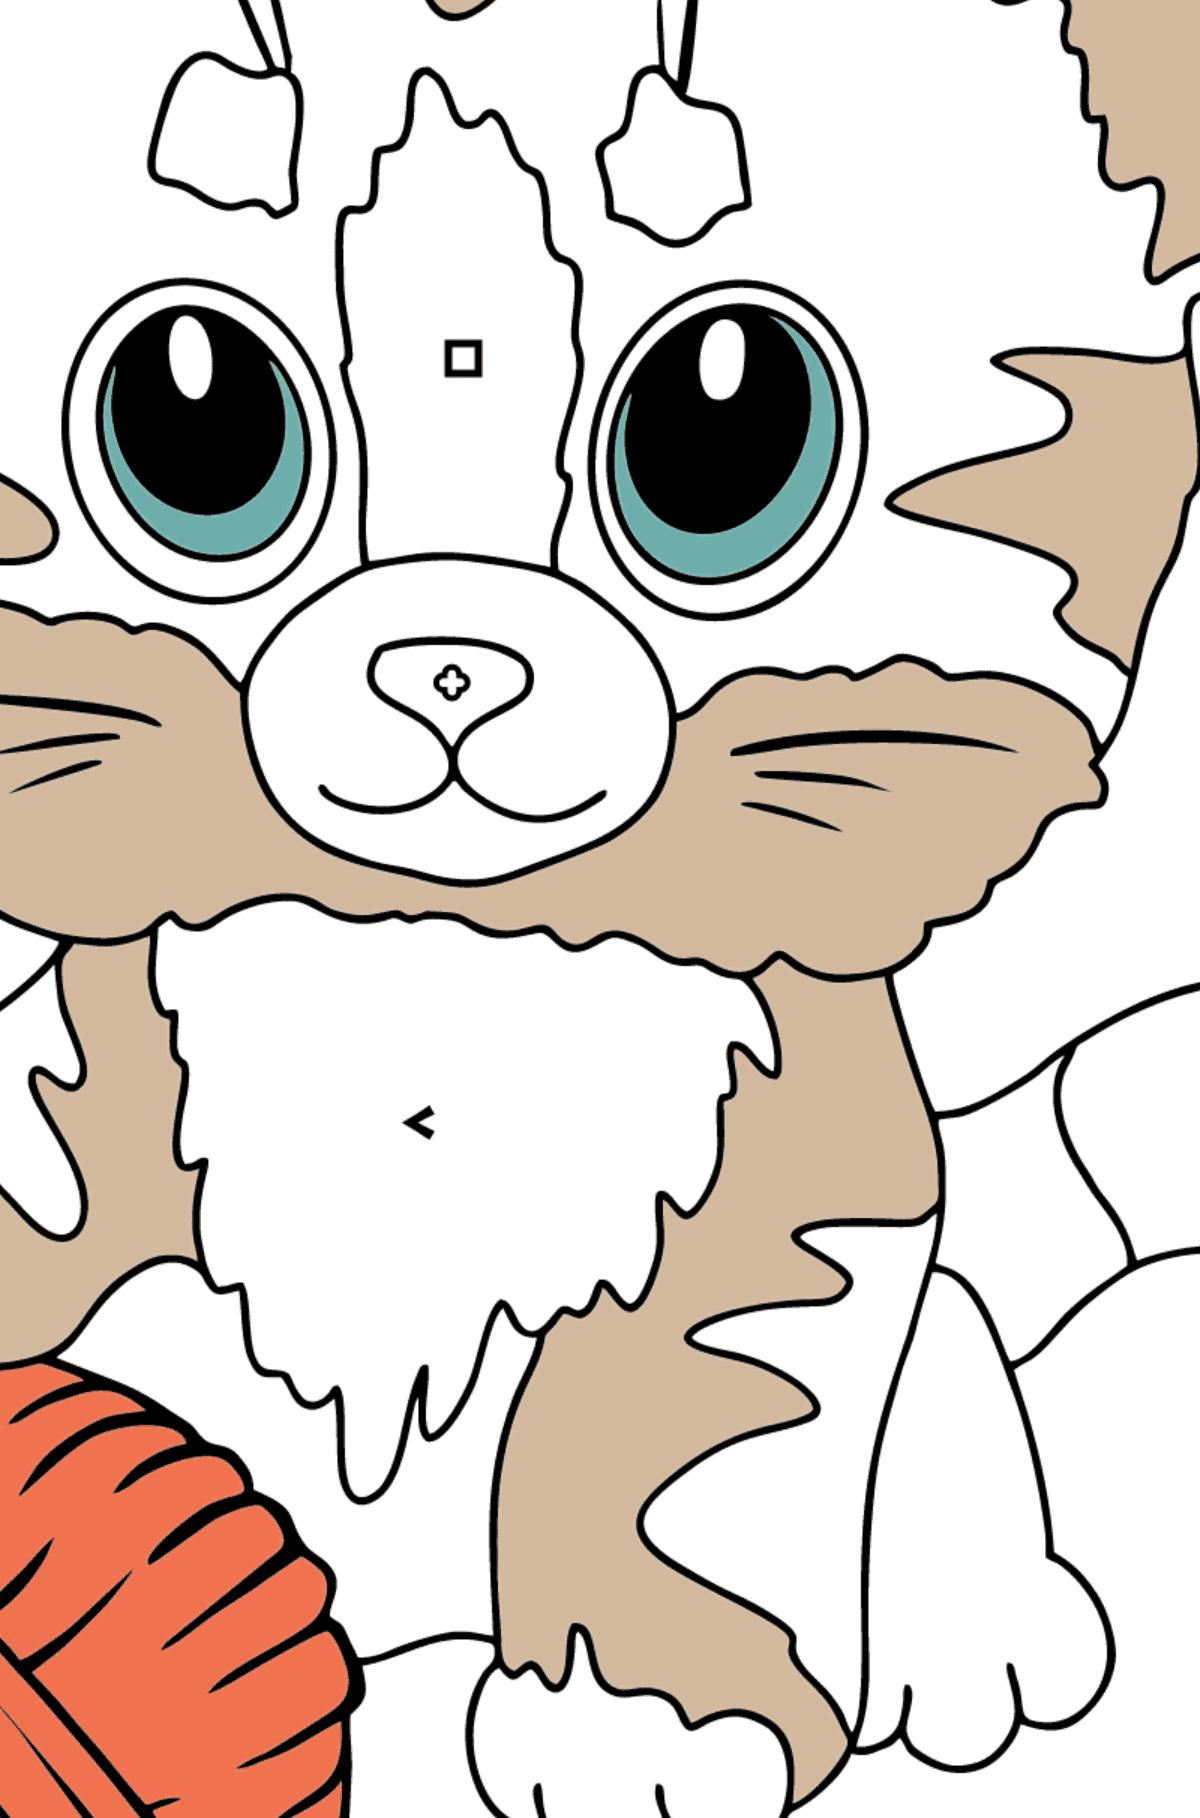 Раскраска котенок поймал клубок ниток - Раскраска по Символам и Геометрическим Фигурам для Детей